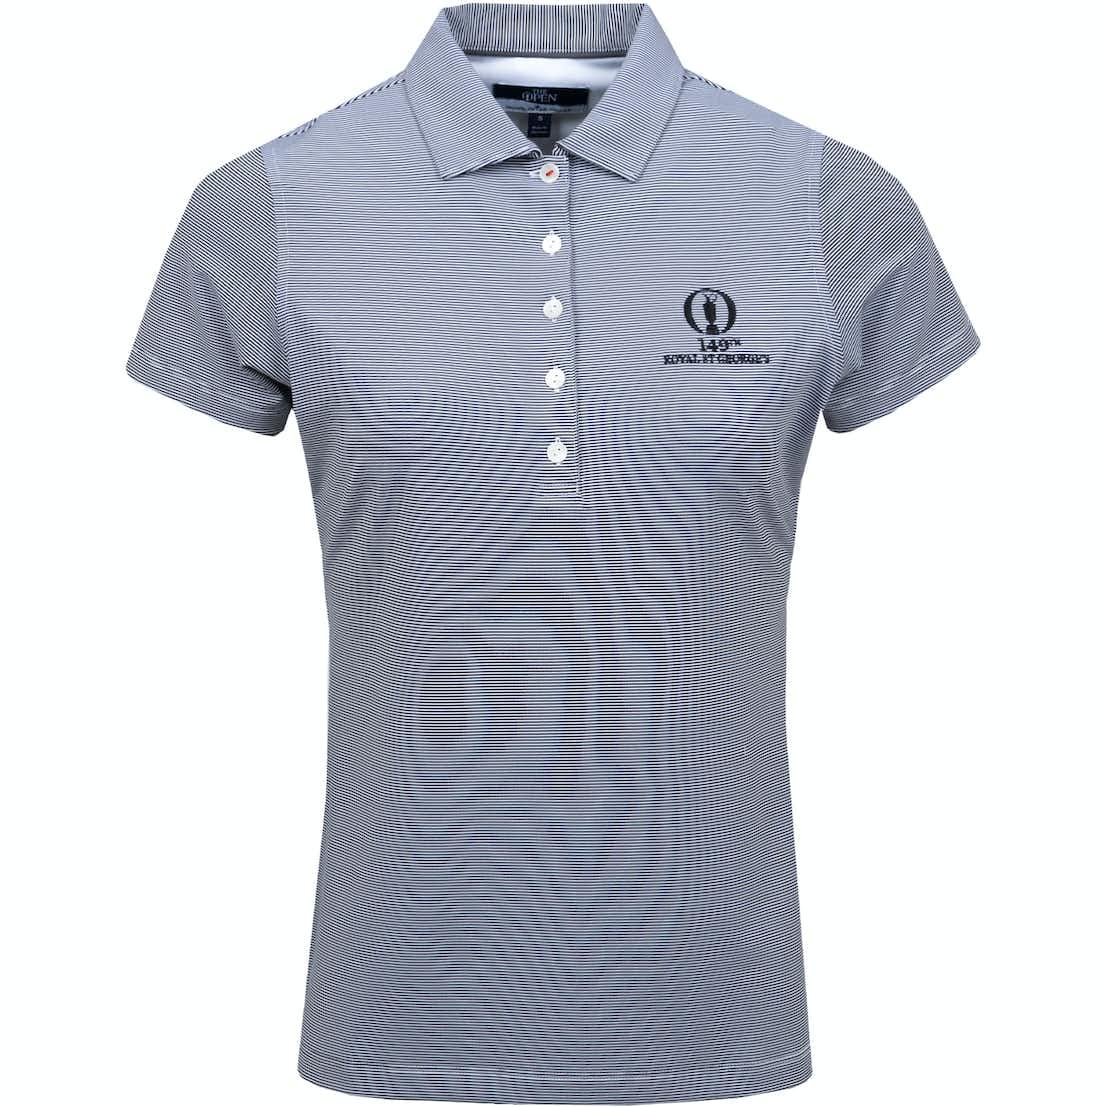 149th Royal St George's Striped Polo Shirt - Grey